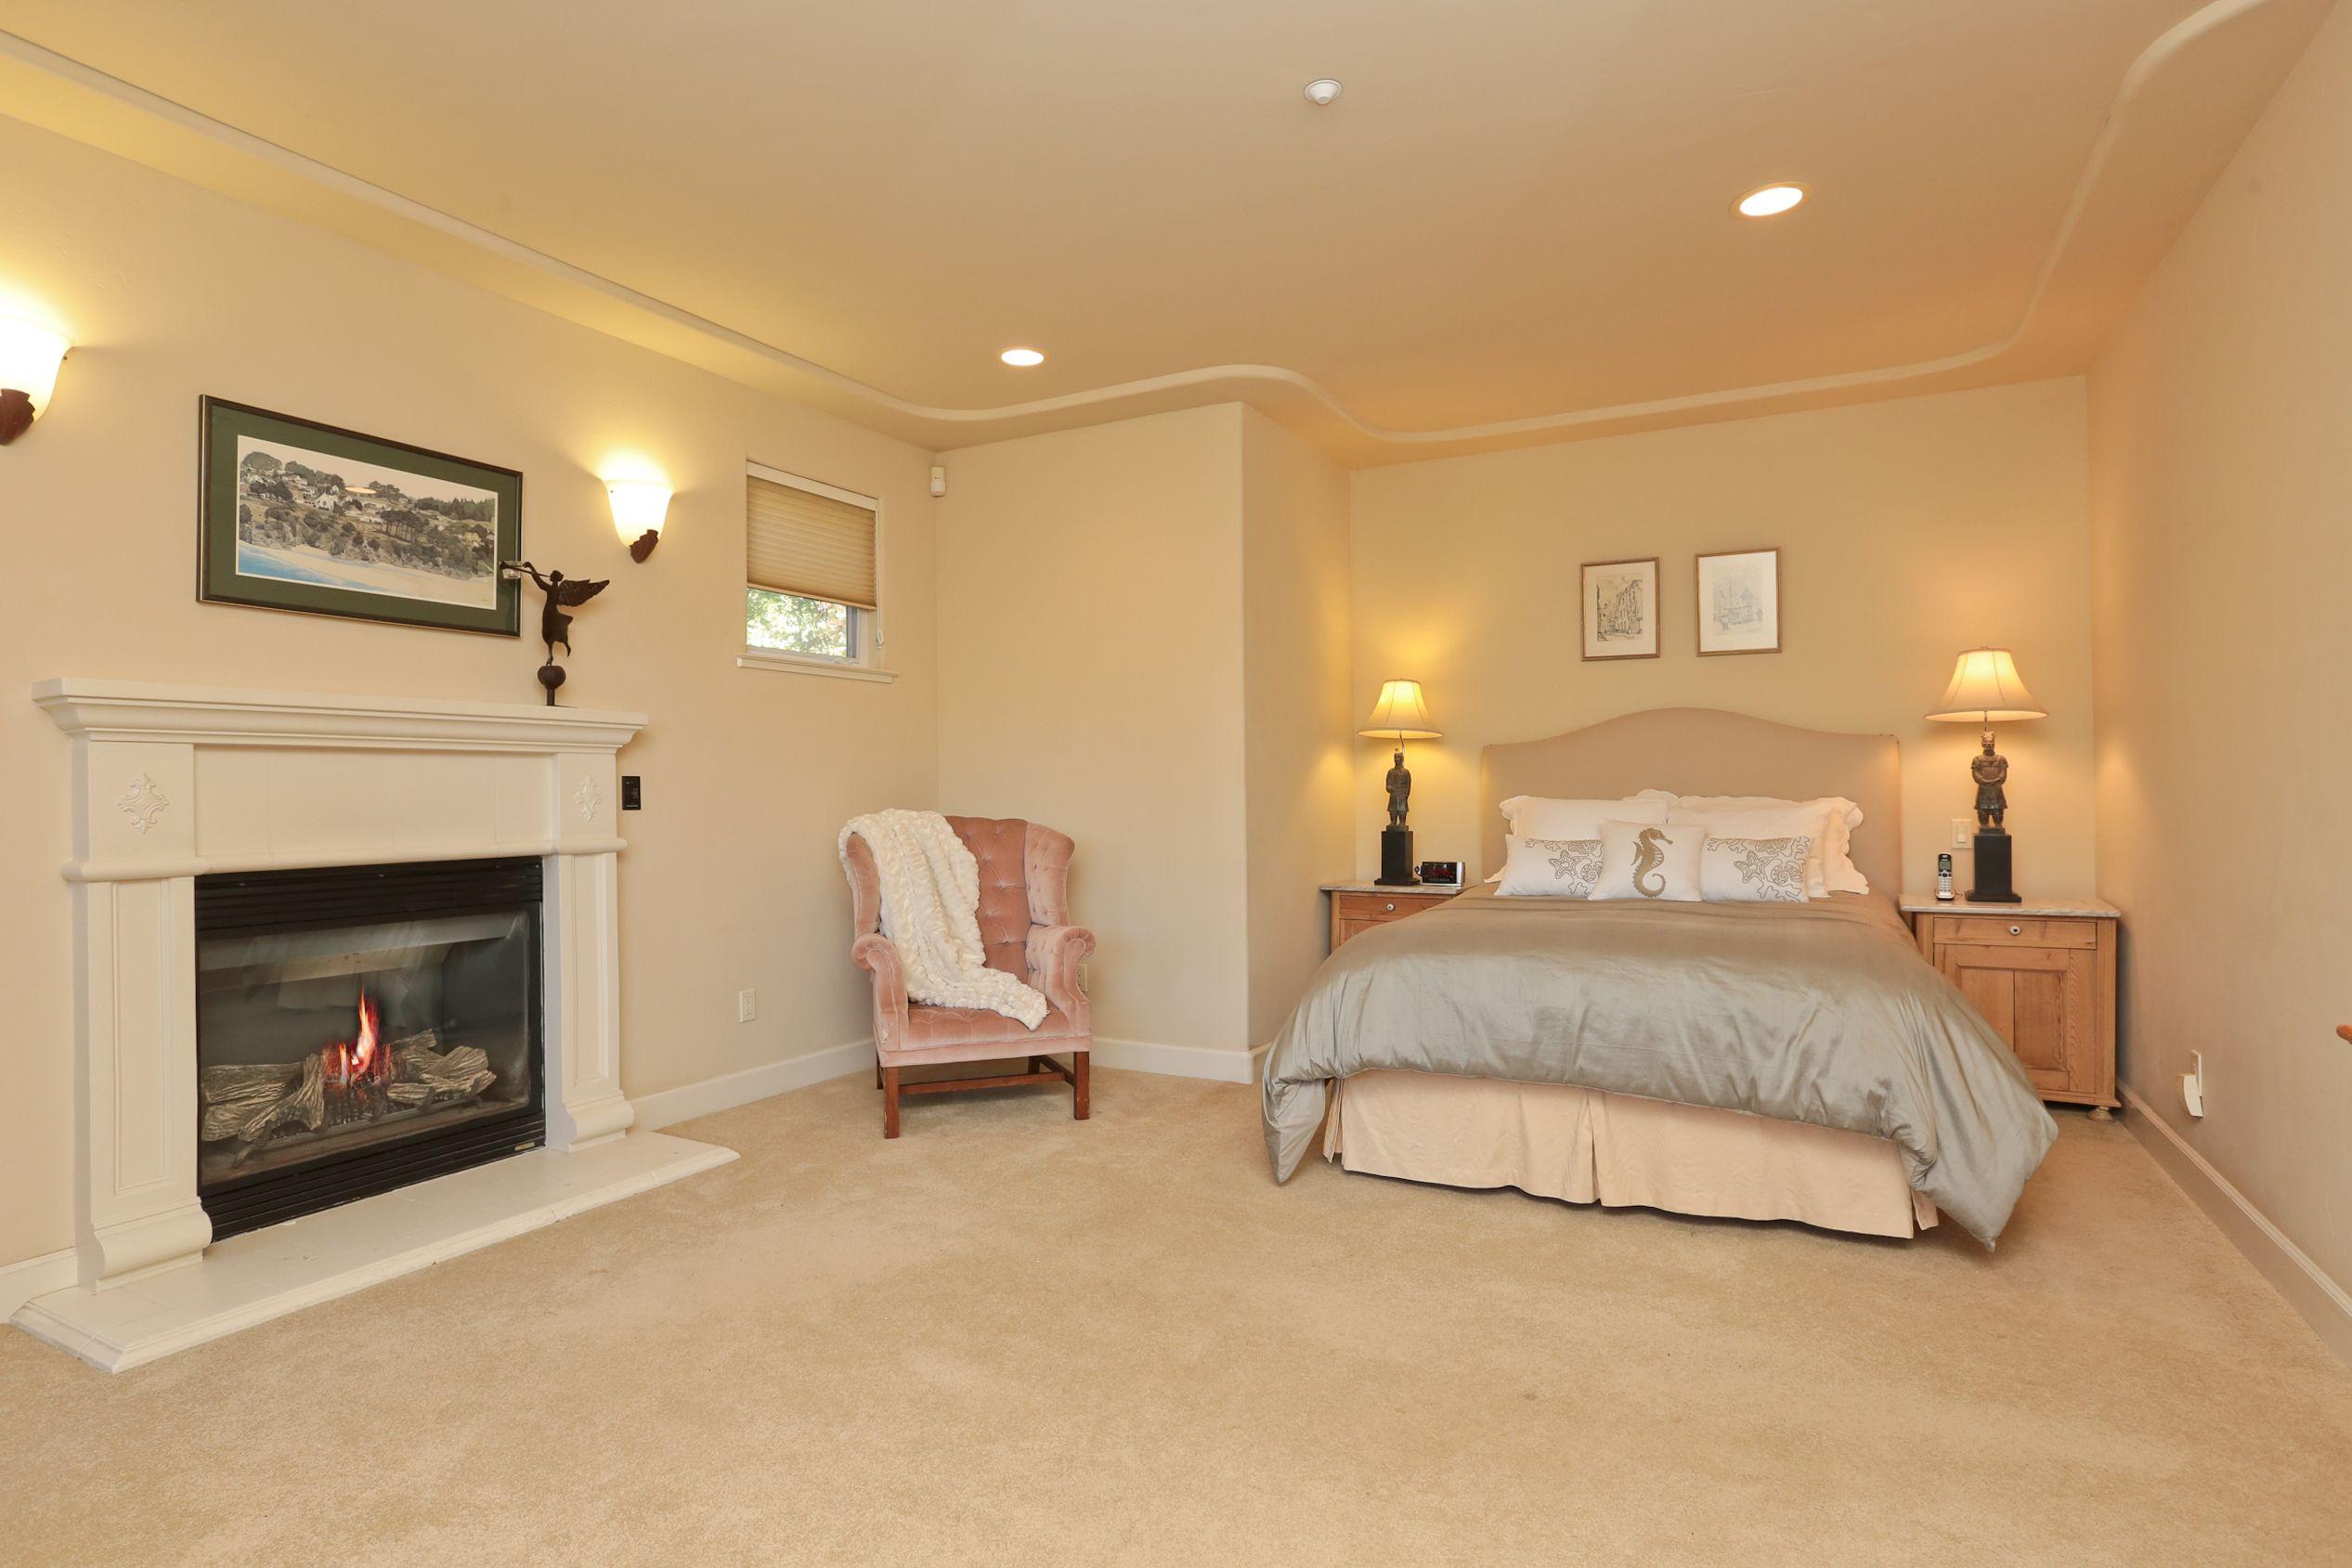 Master bedroom huge  Huge Master Bedroom Suite with fireplace and substantial floor space